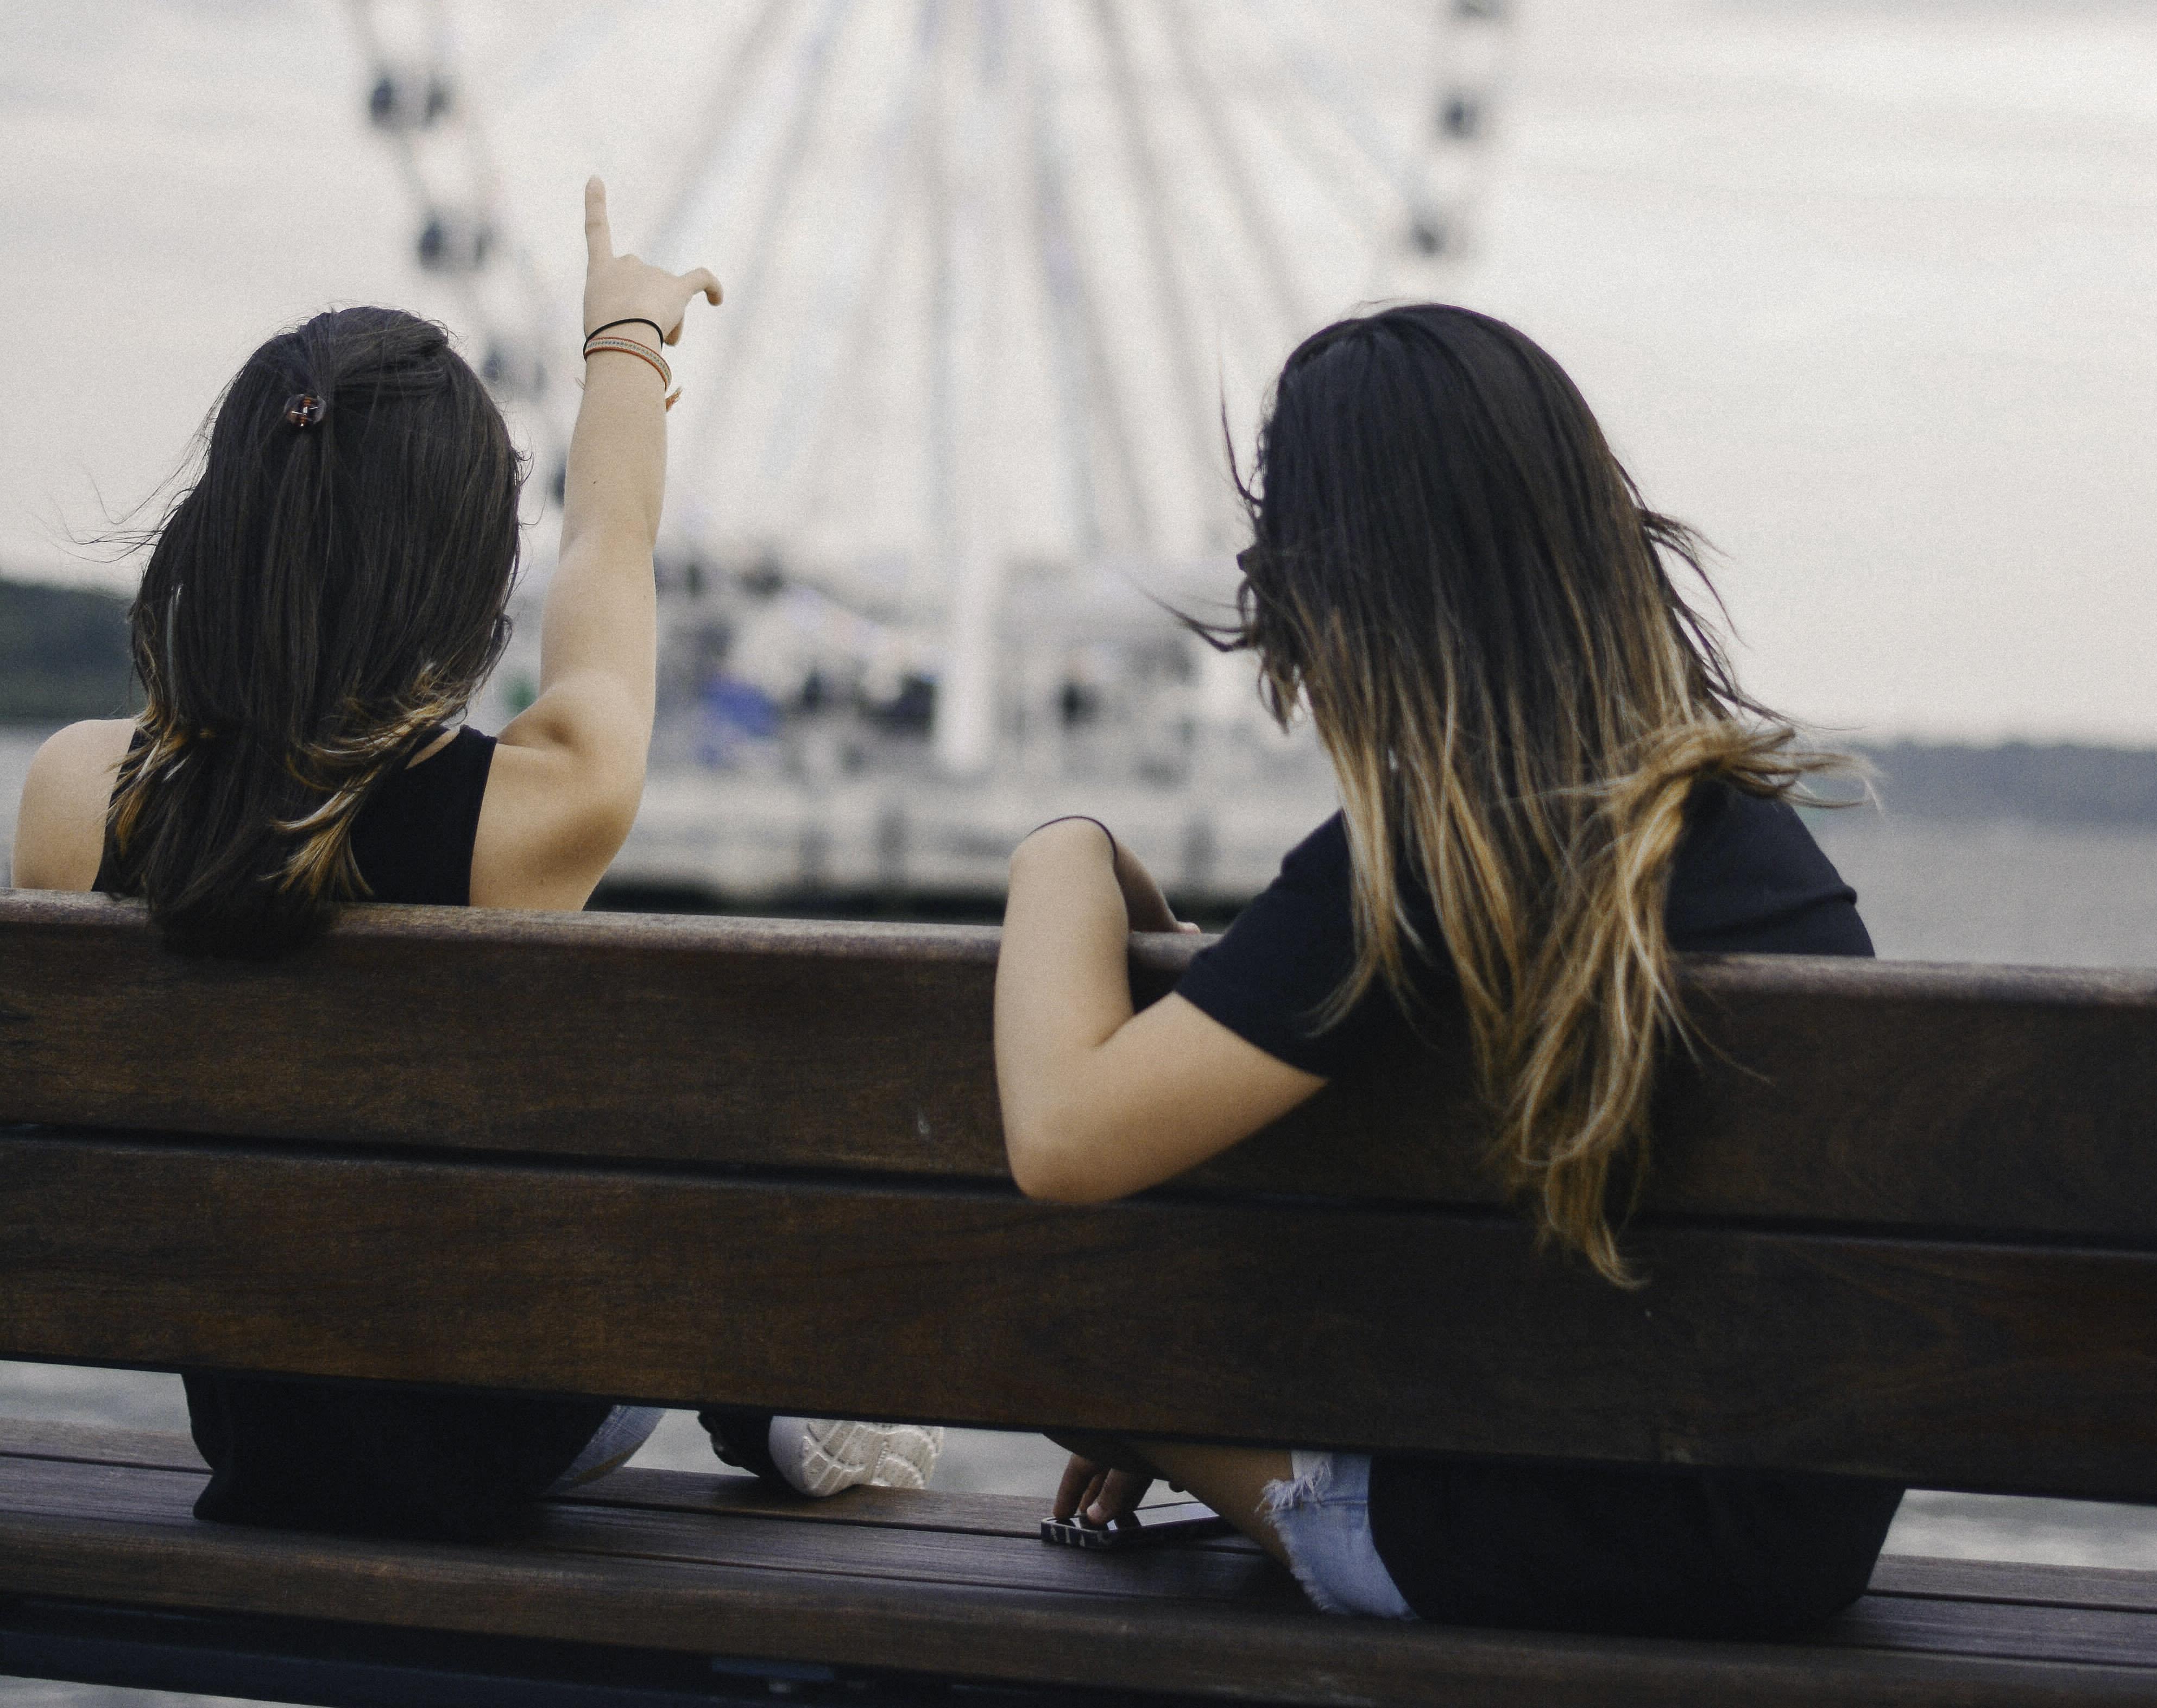 Two women watching a ferris wheel